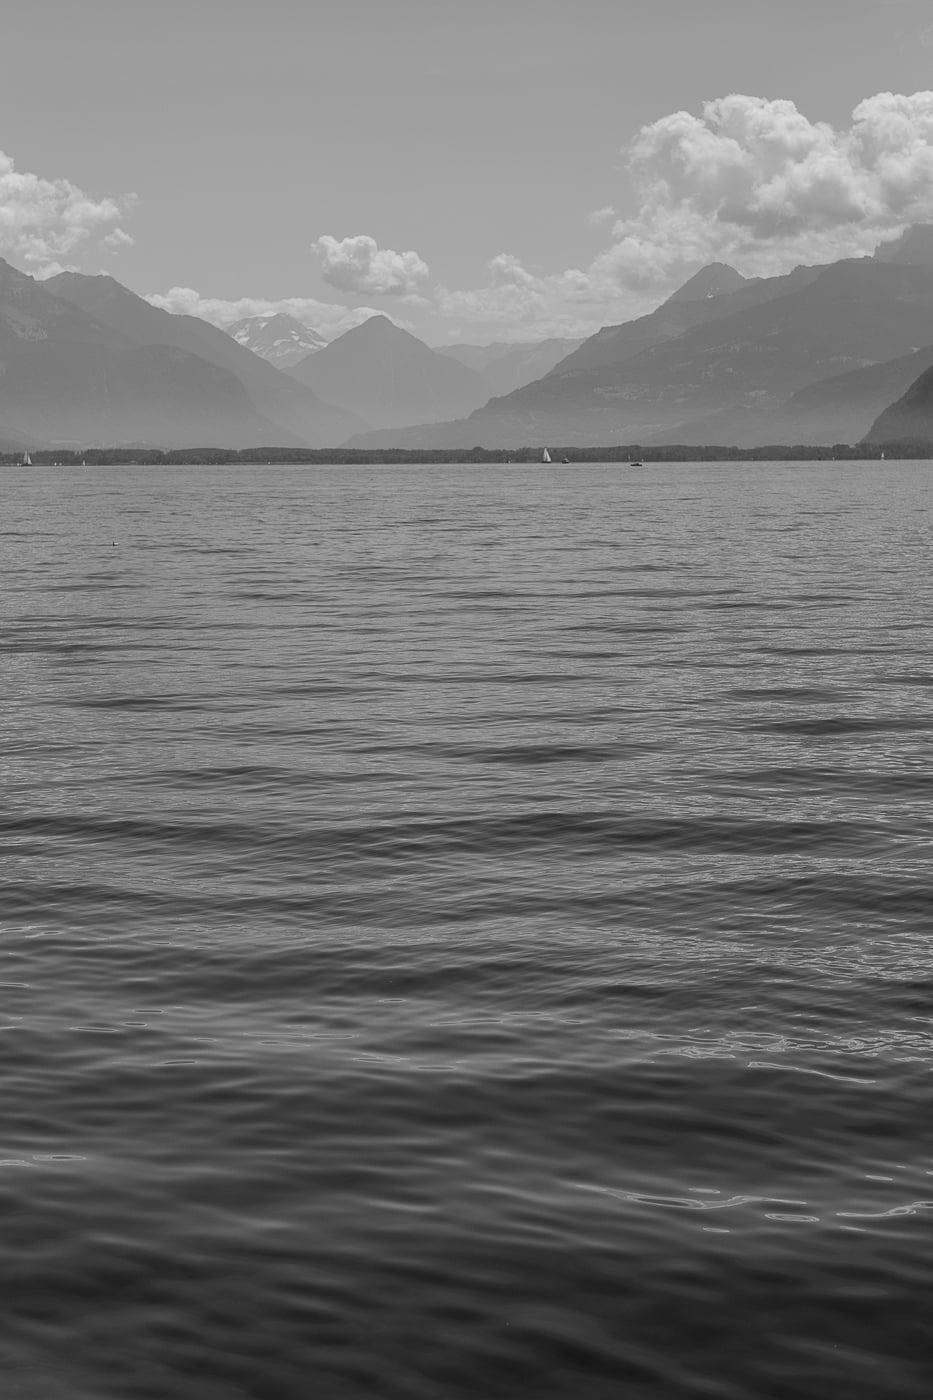 Lac Leman in Schwarzweiss